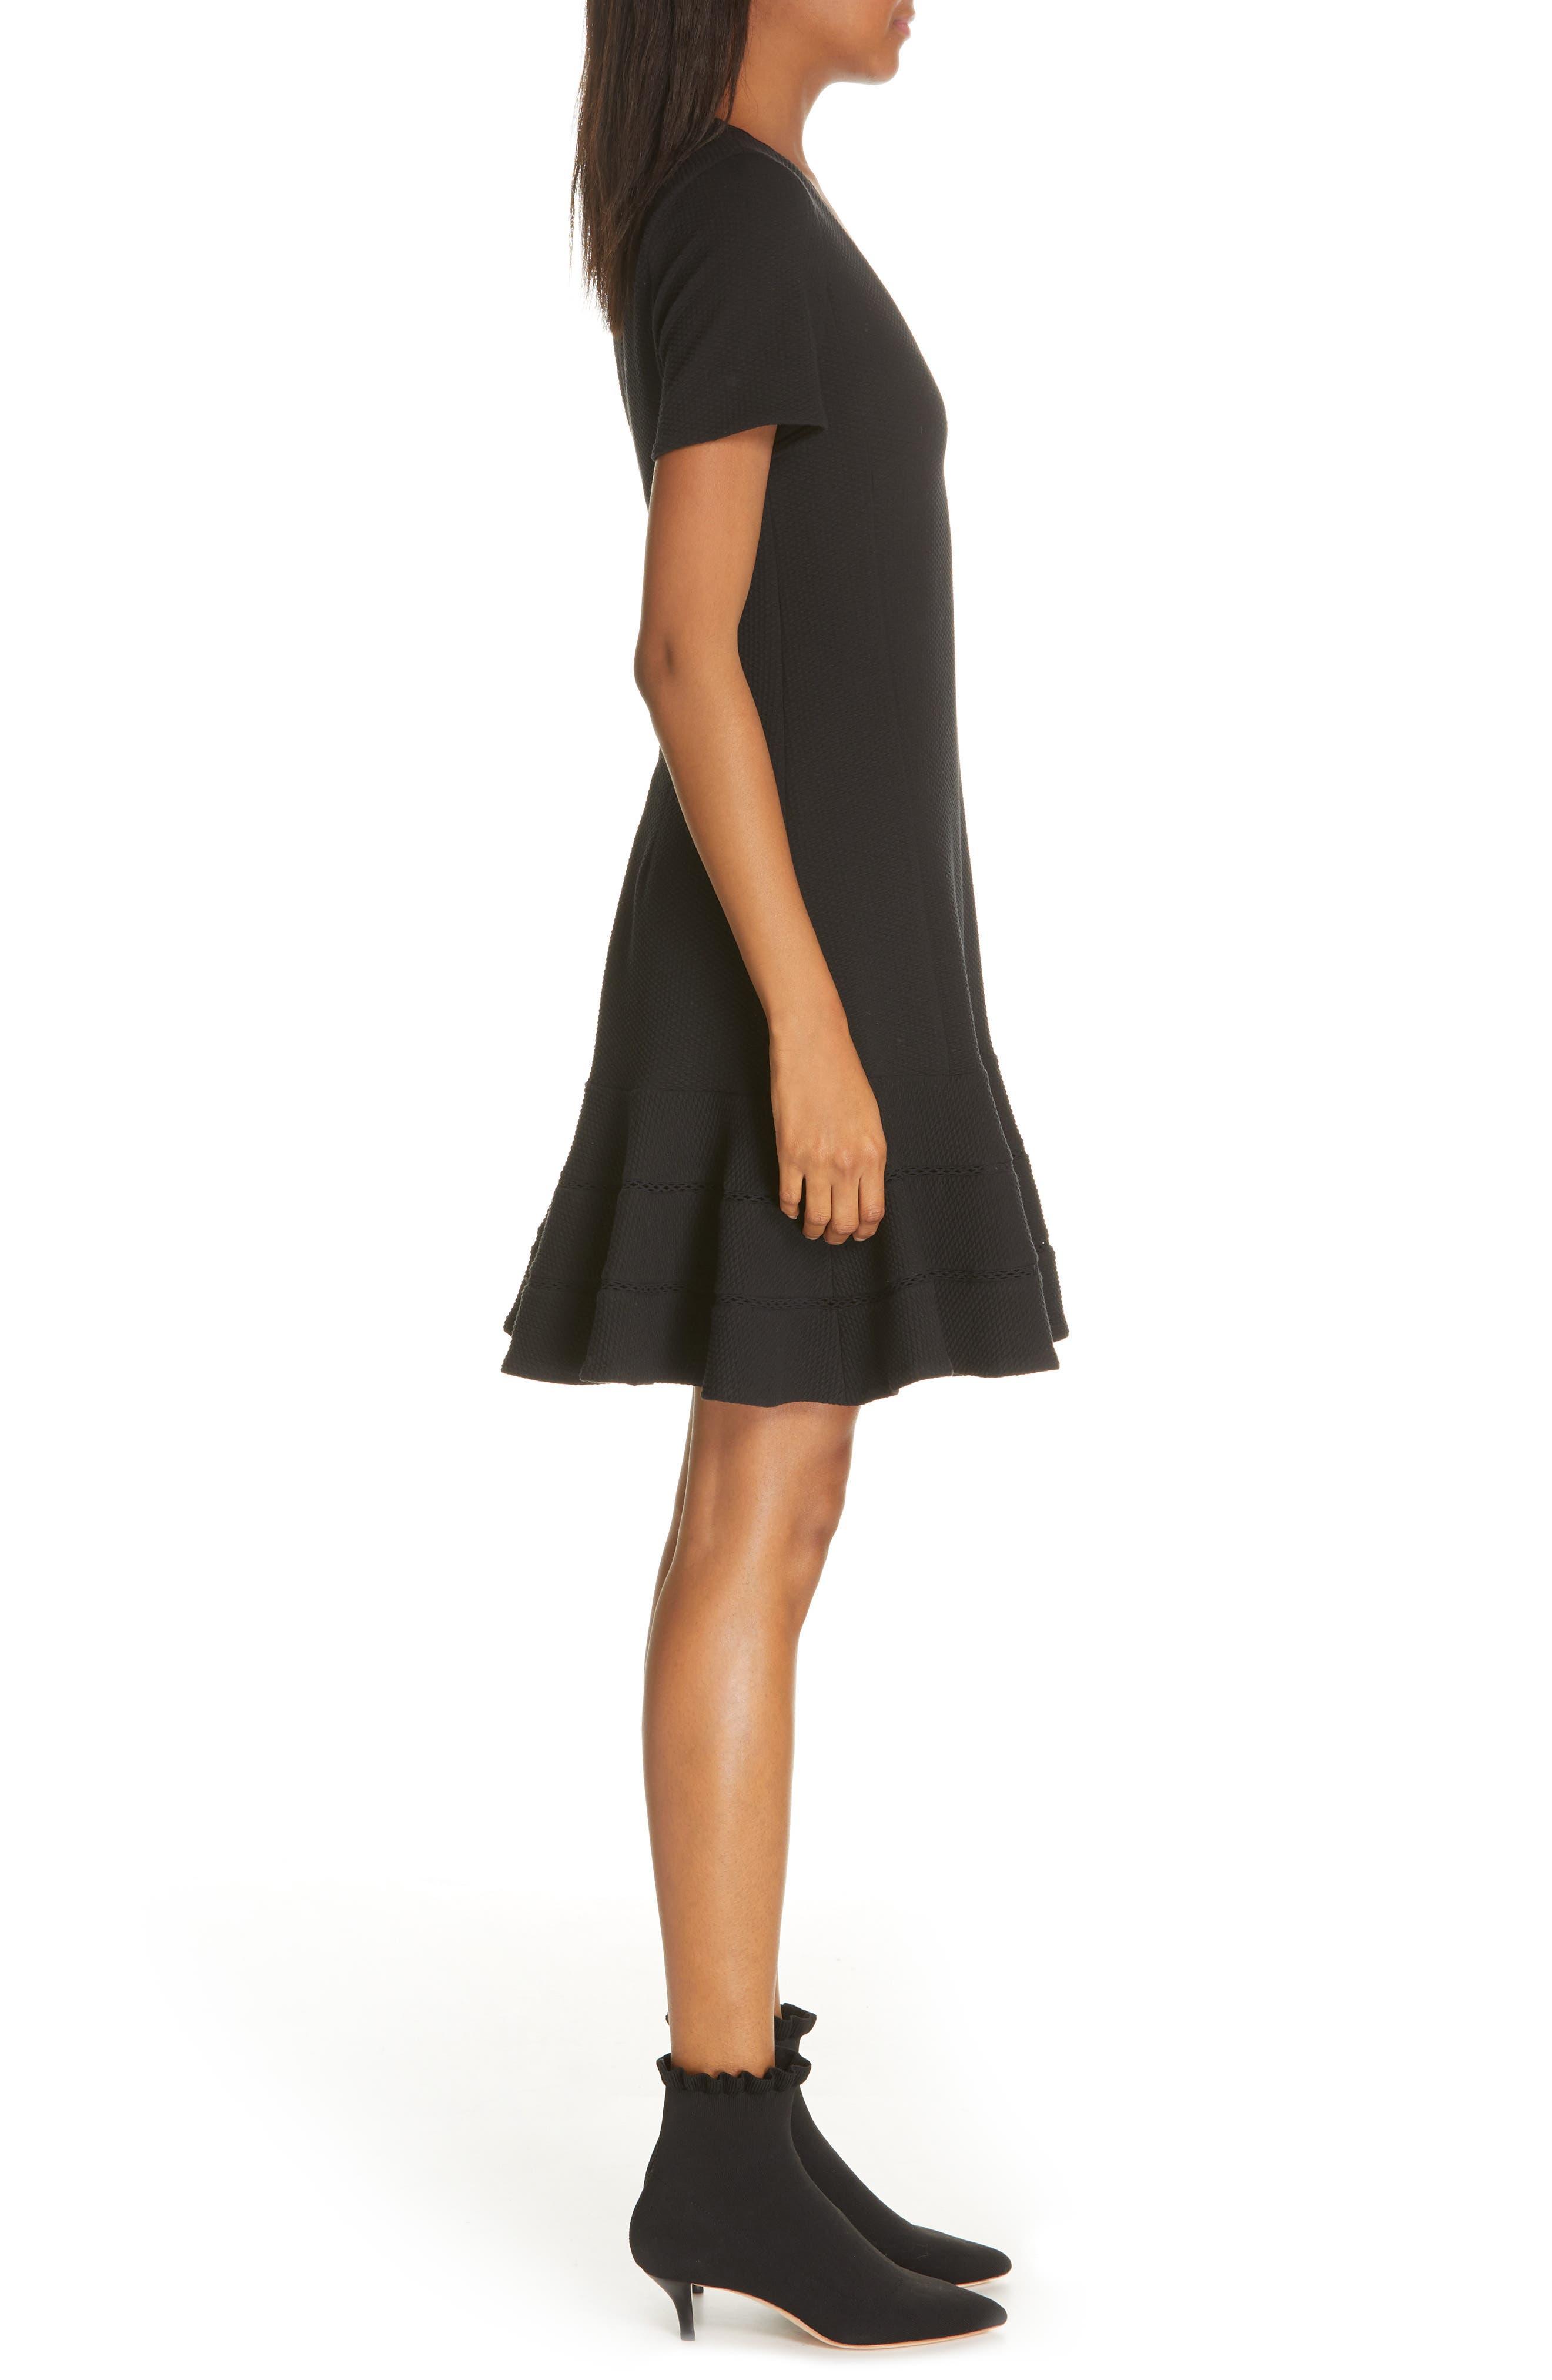 REBECCA TAYLOR, Fit & Flare Dress, Alternate thumbnail 3, color, BLACK